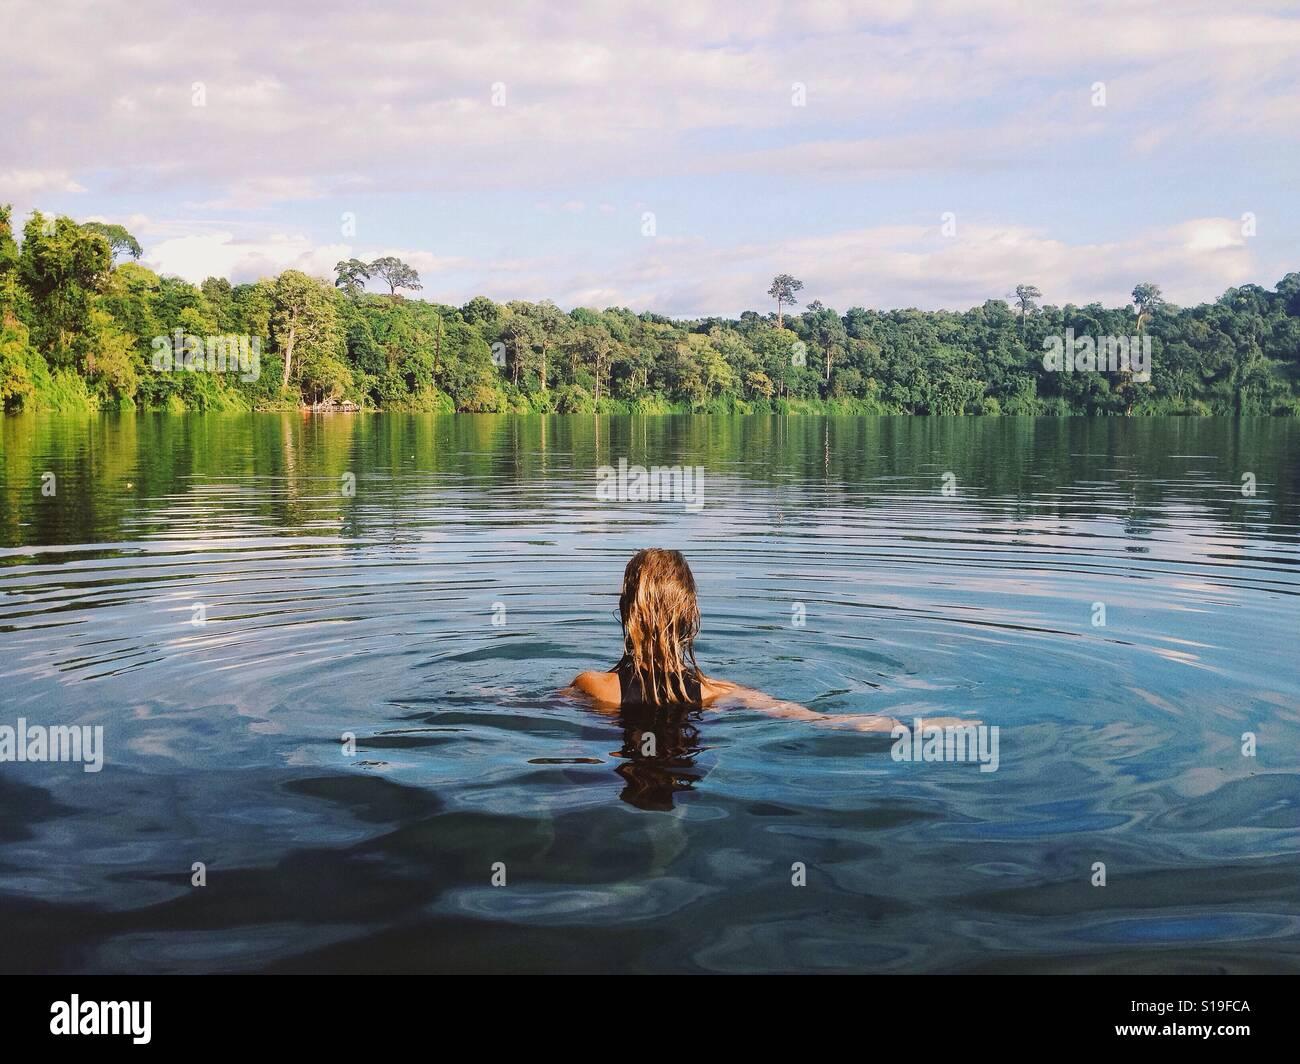 Nuotare nel lago Immagini Stock